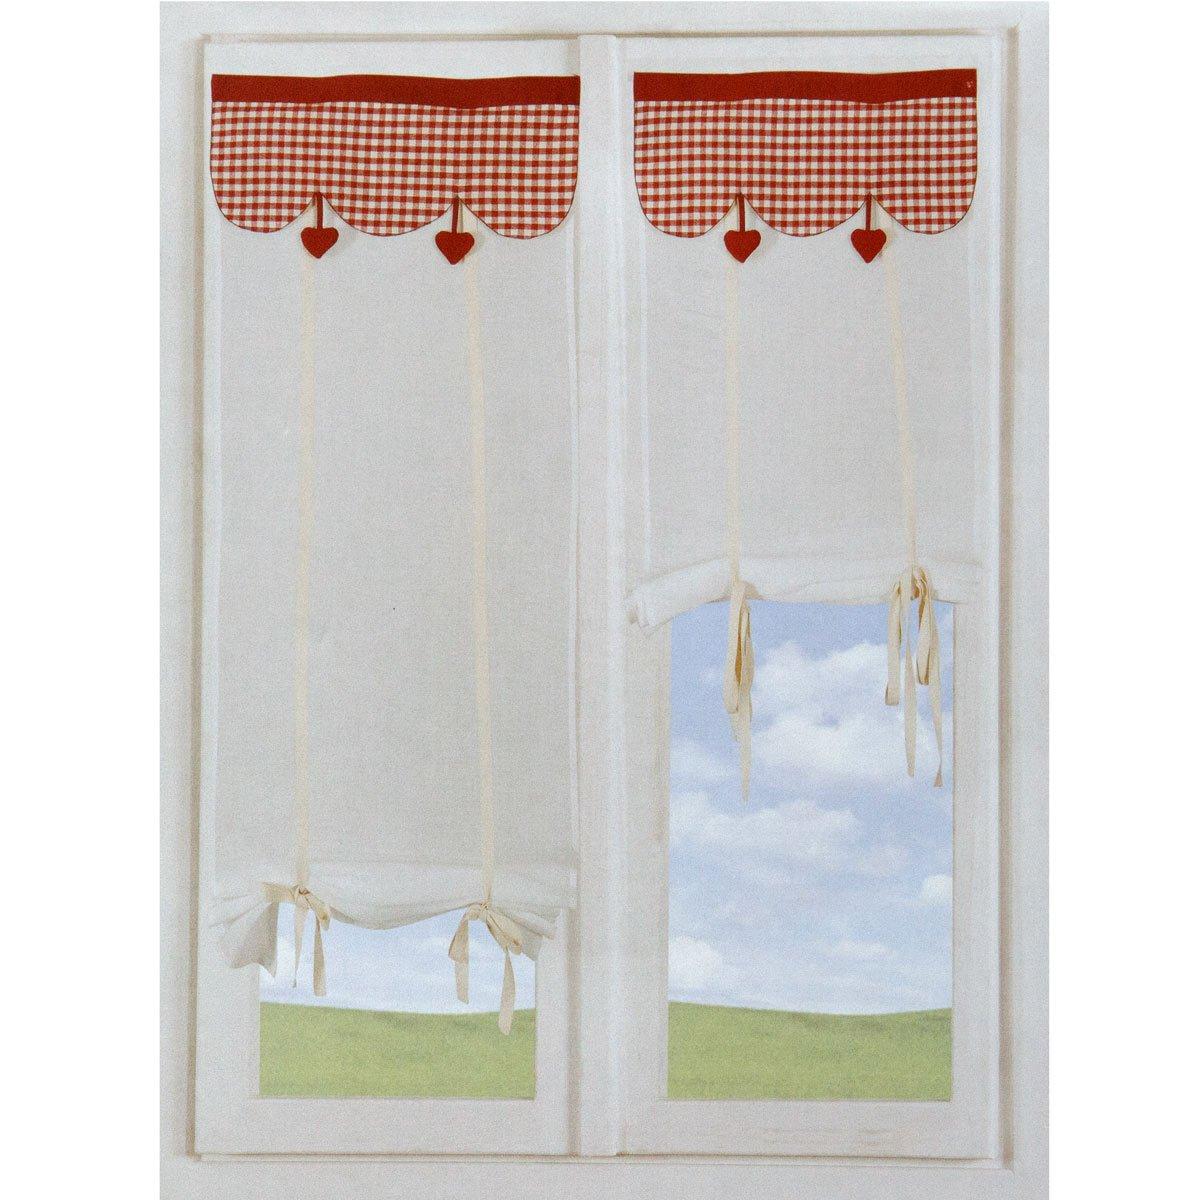 Coppia Tende tendine regolabili vetro finestra 60x150 cm Wendy ...